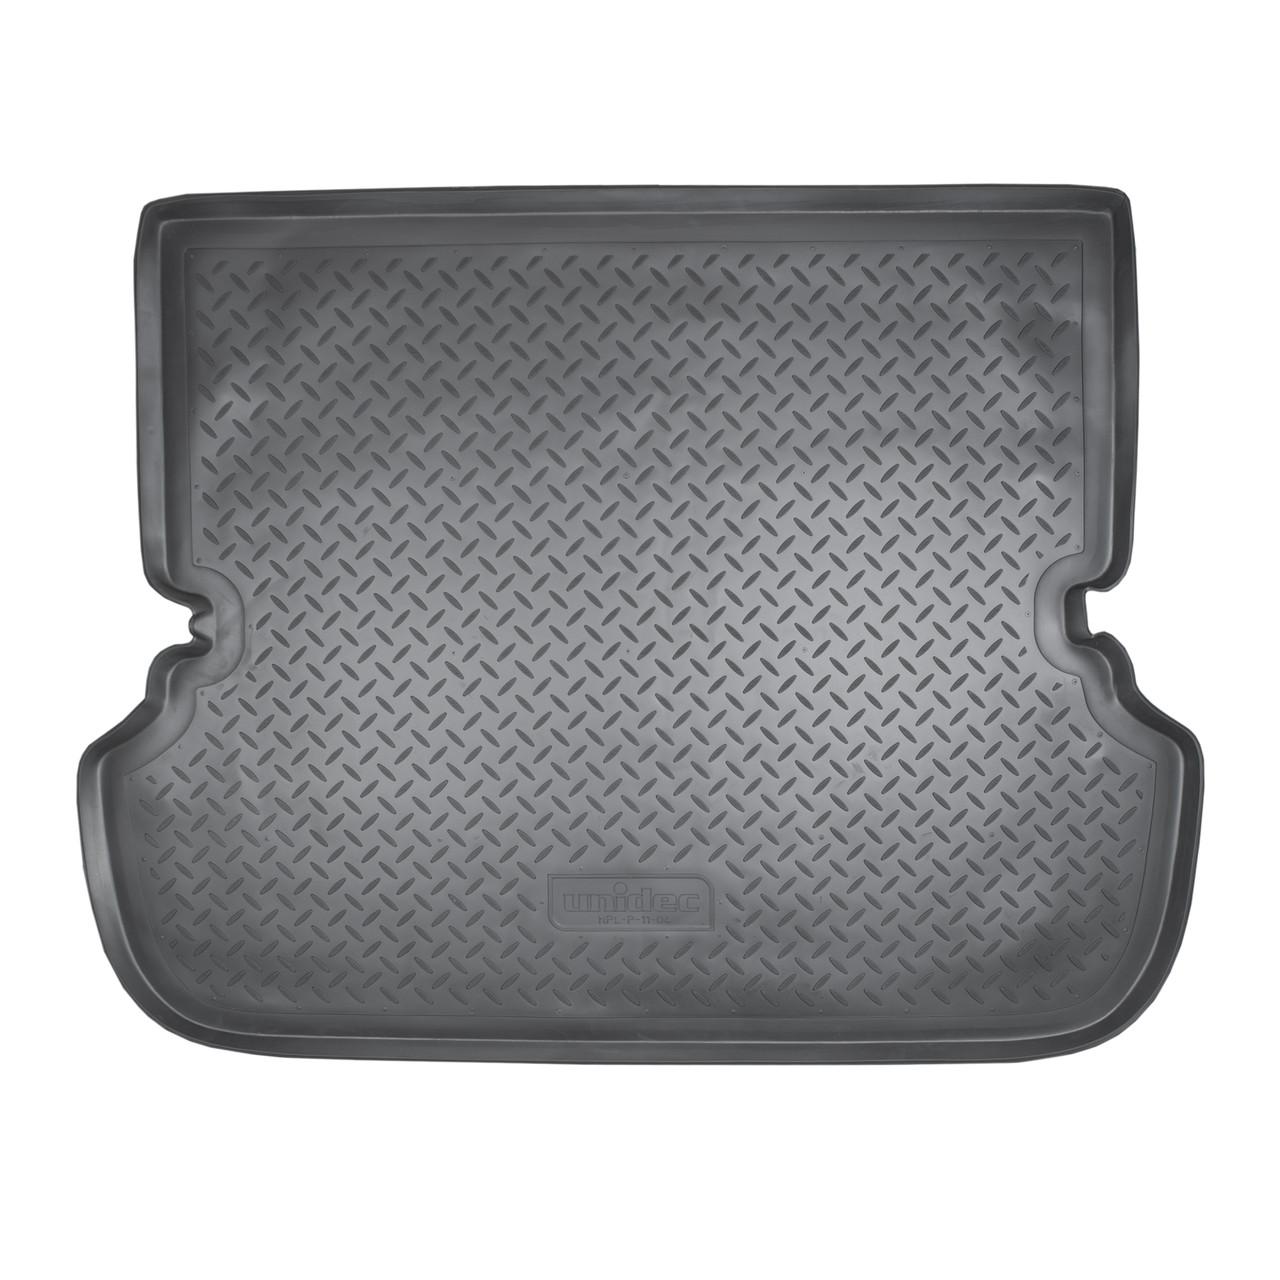 Коврик в багажник Chery CrossEastar (B14) универсал (2006-2014)